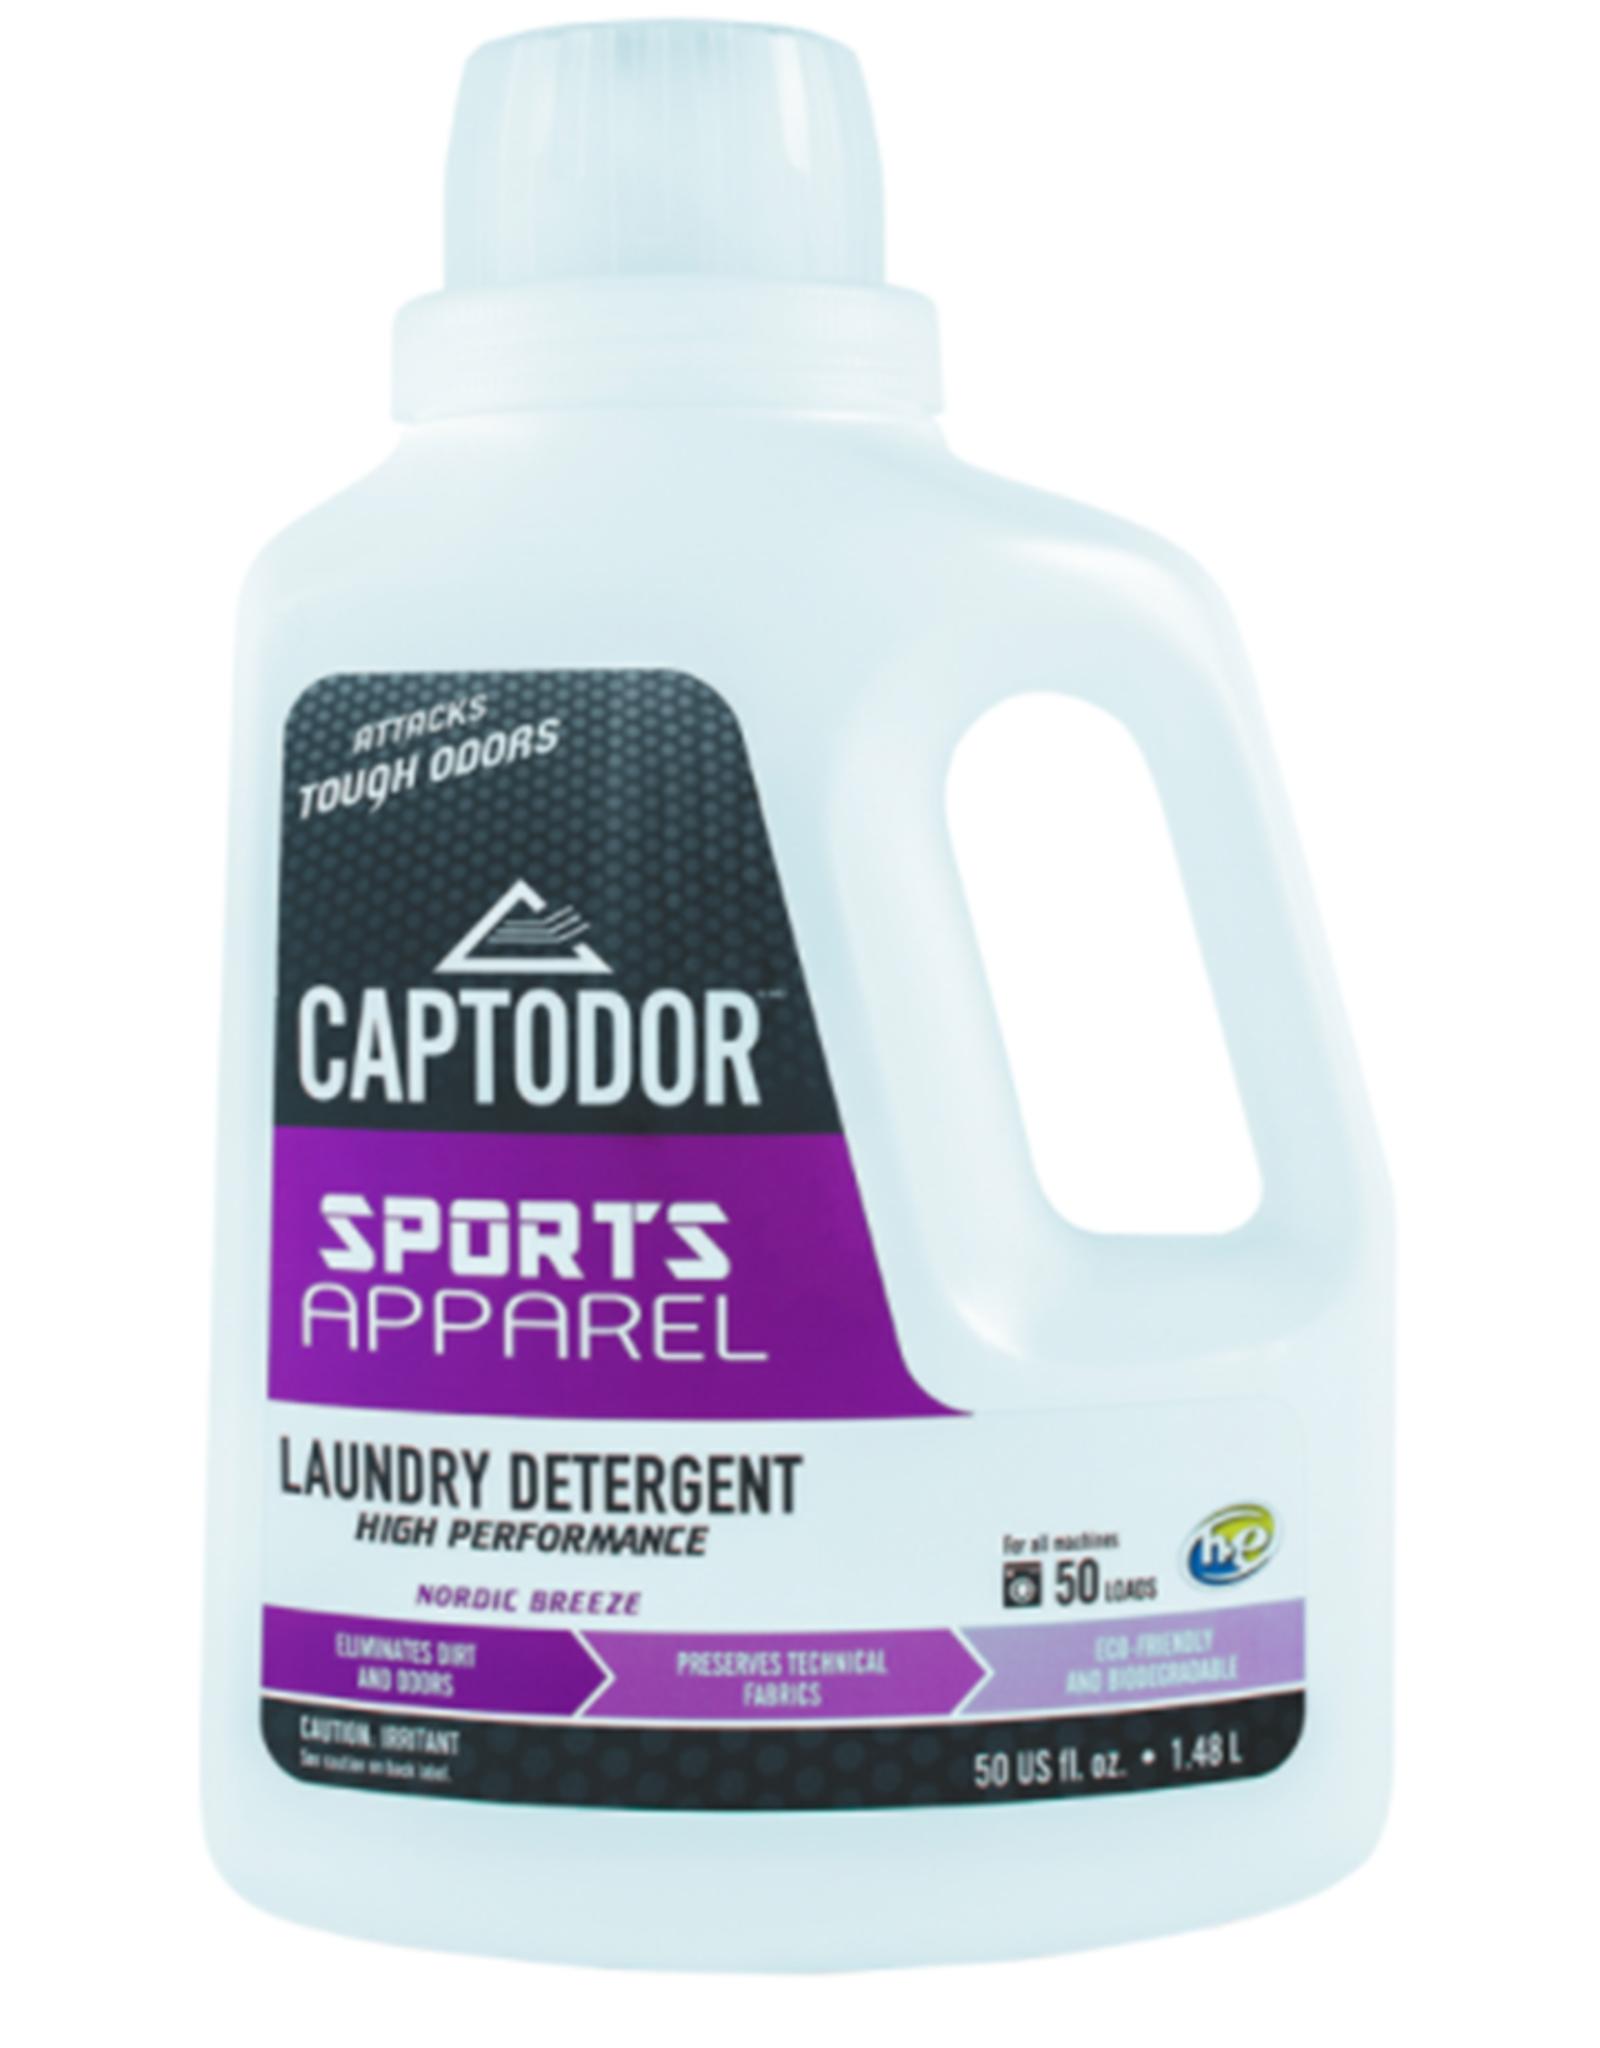 Captodor Sports Laundry Detergent